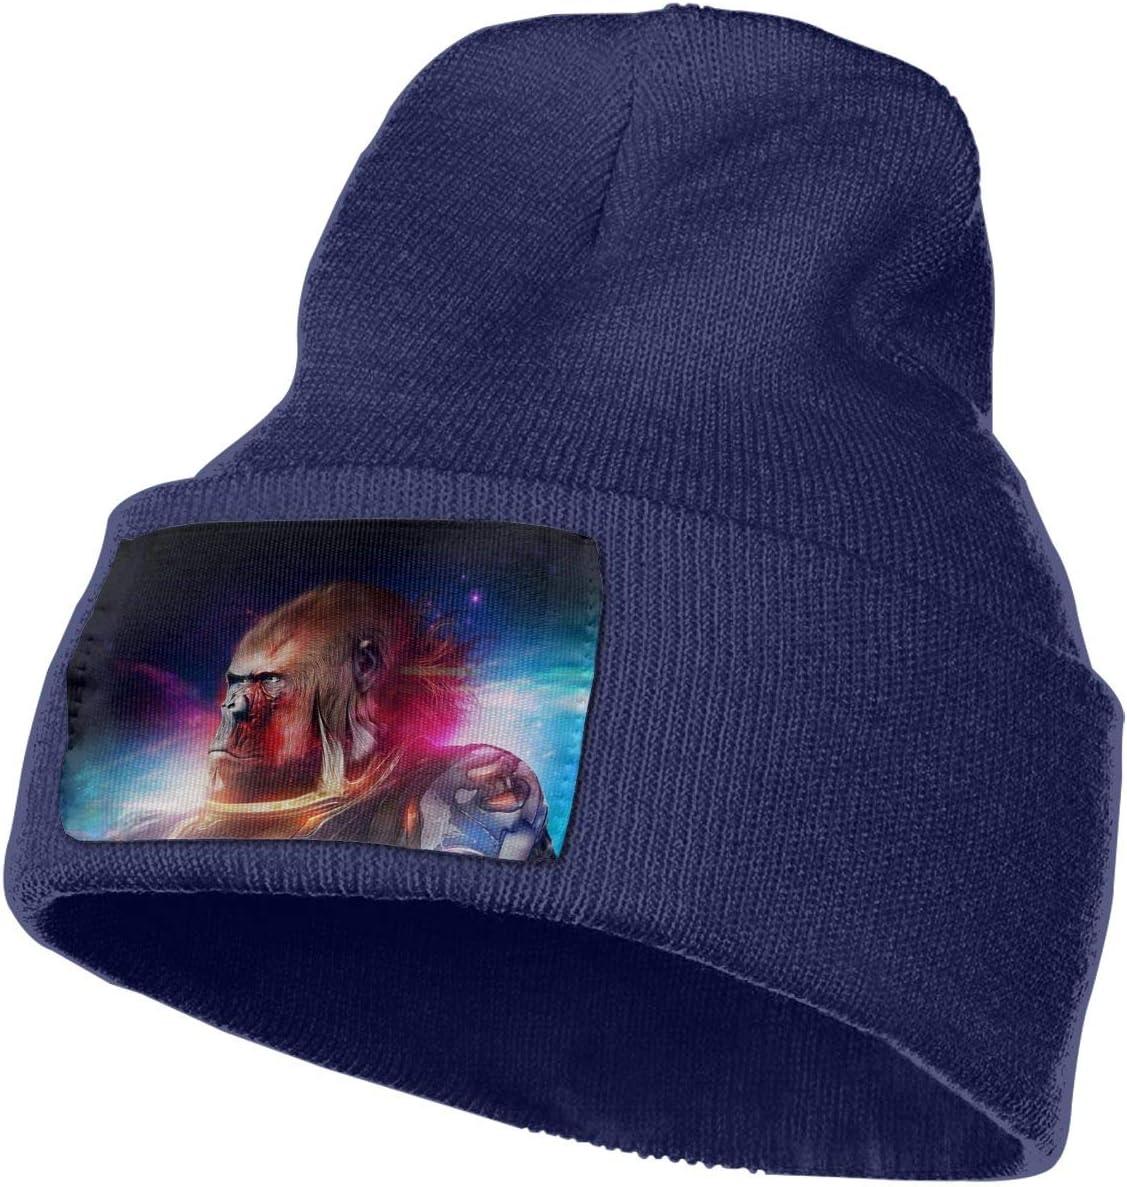 Space Gorilla Men/&Women Warm Winter Knit Plain Beanie Hat Skull Cap Acrylic Knit Cuff Hat